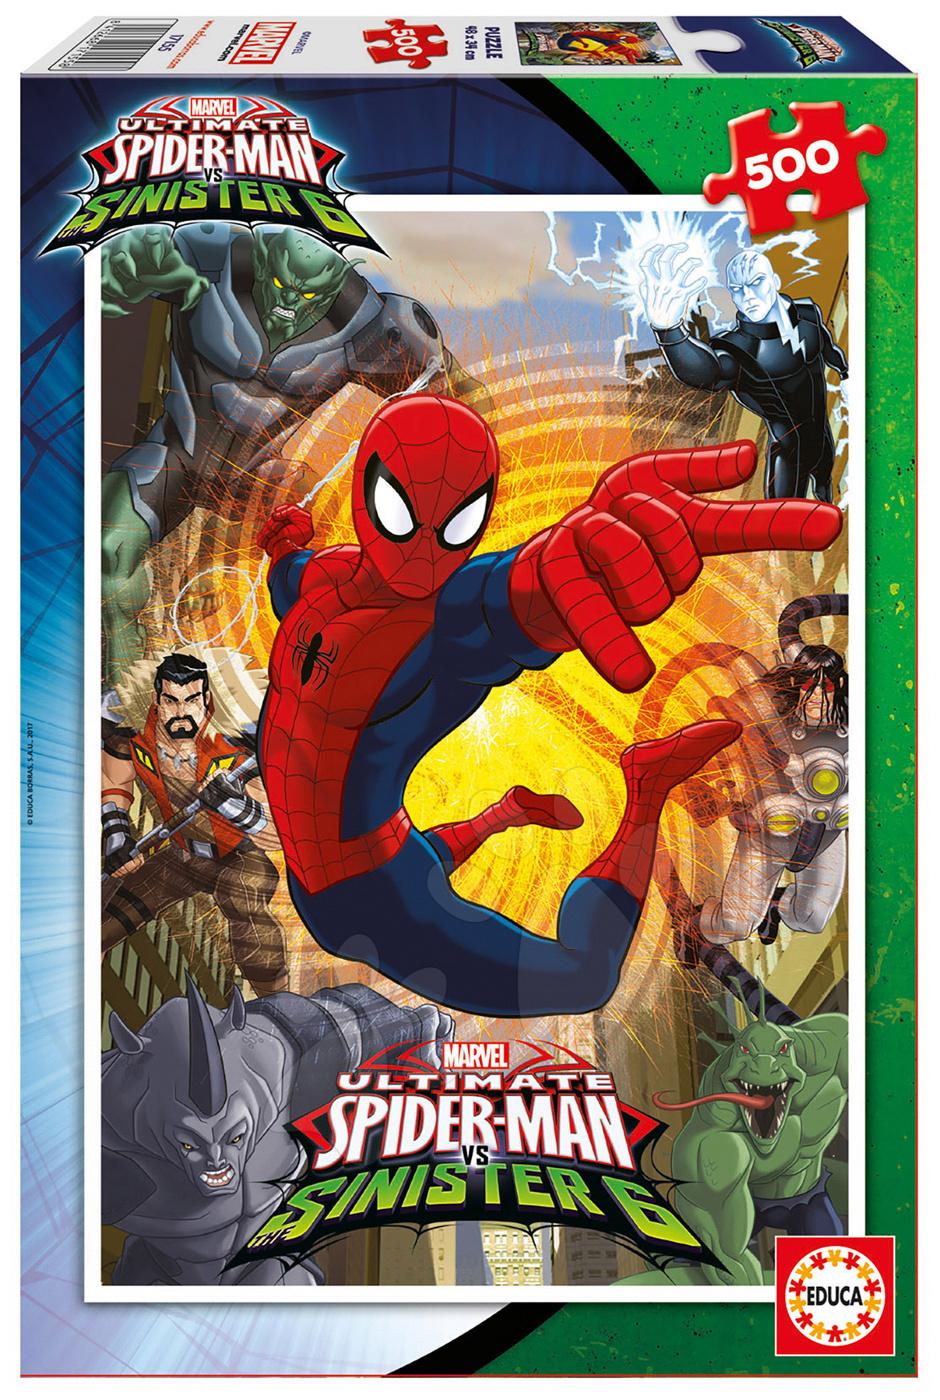 Puzzle Marvel Ultimate Spiderman vs. The Sinister 6 Educa 500 dílů od 11 let